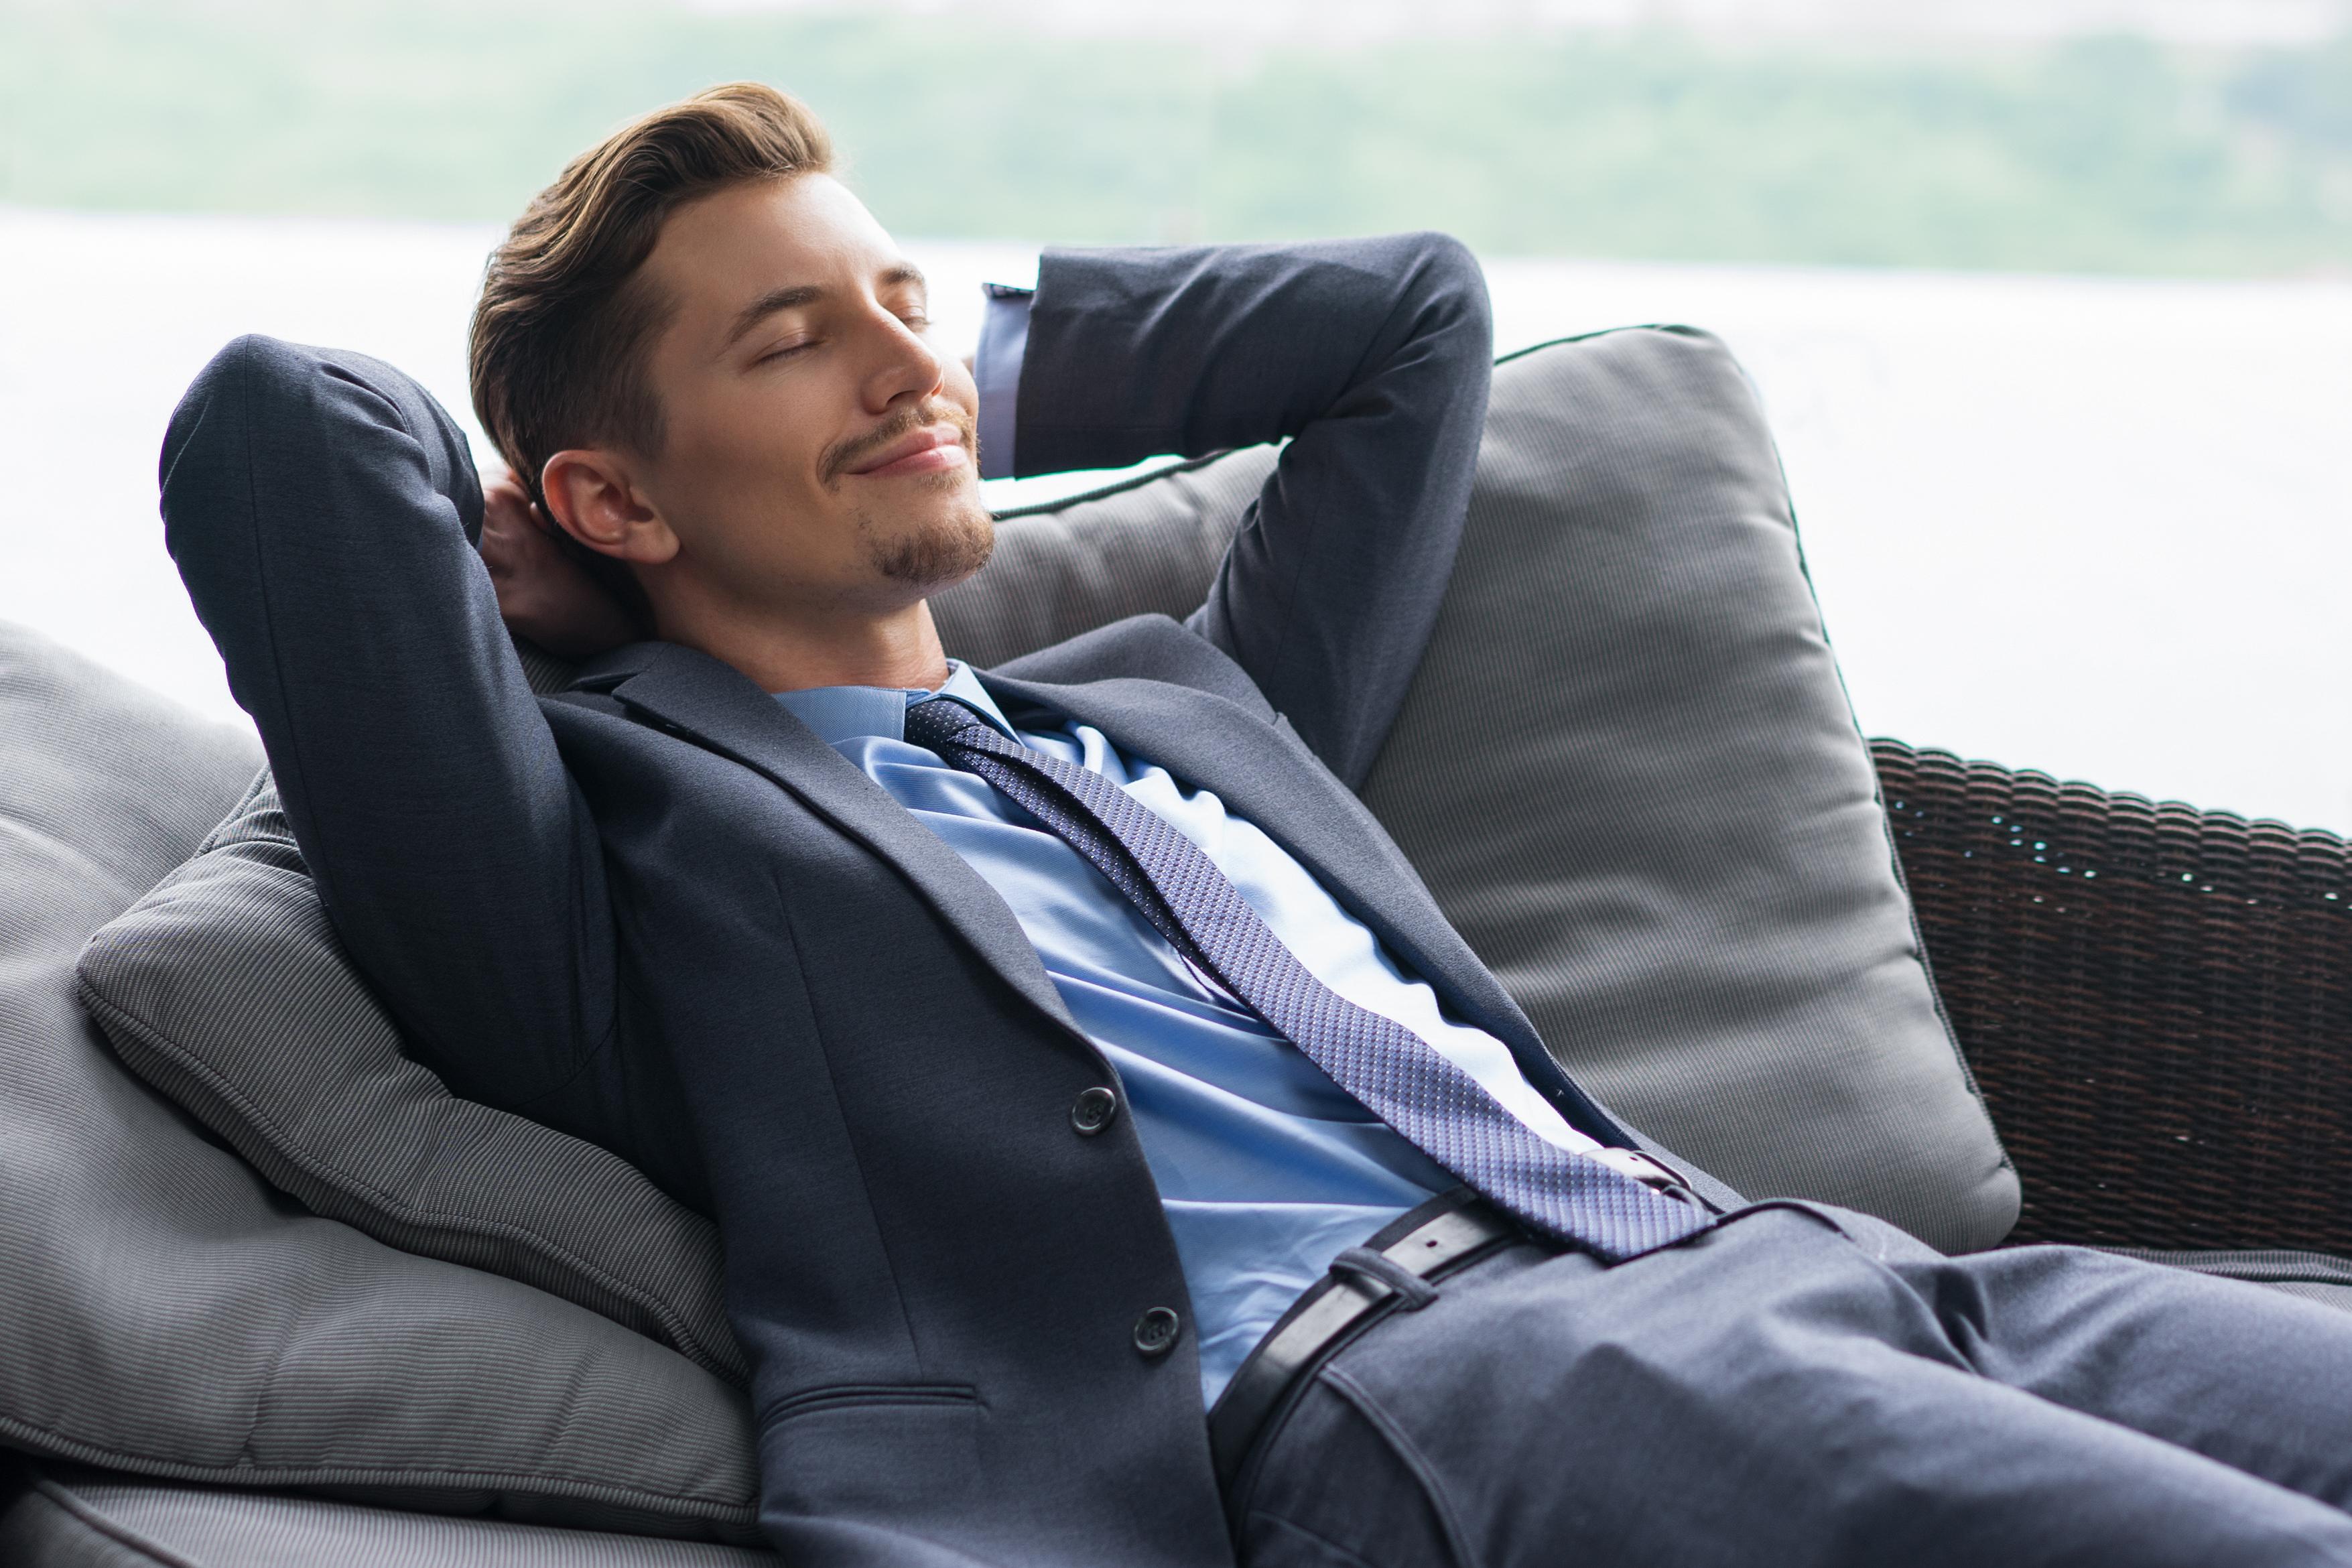 Should Startups take holidays?, Qllen, Leadership, Entrepreneur, Business magazine, blog